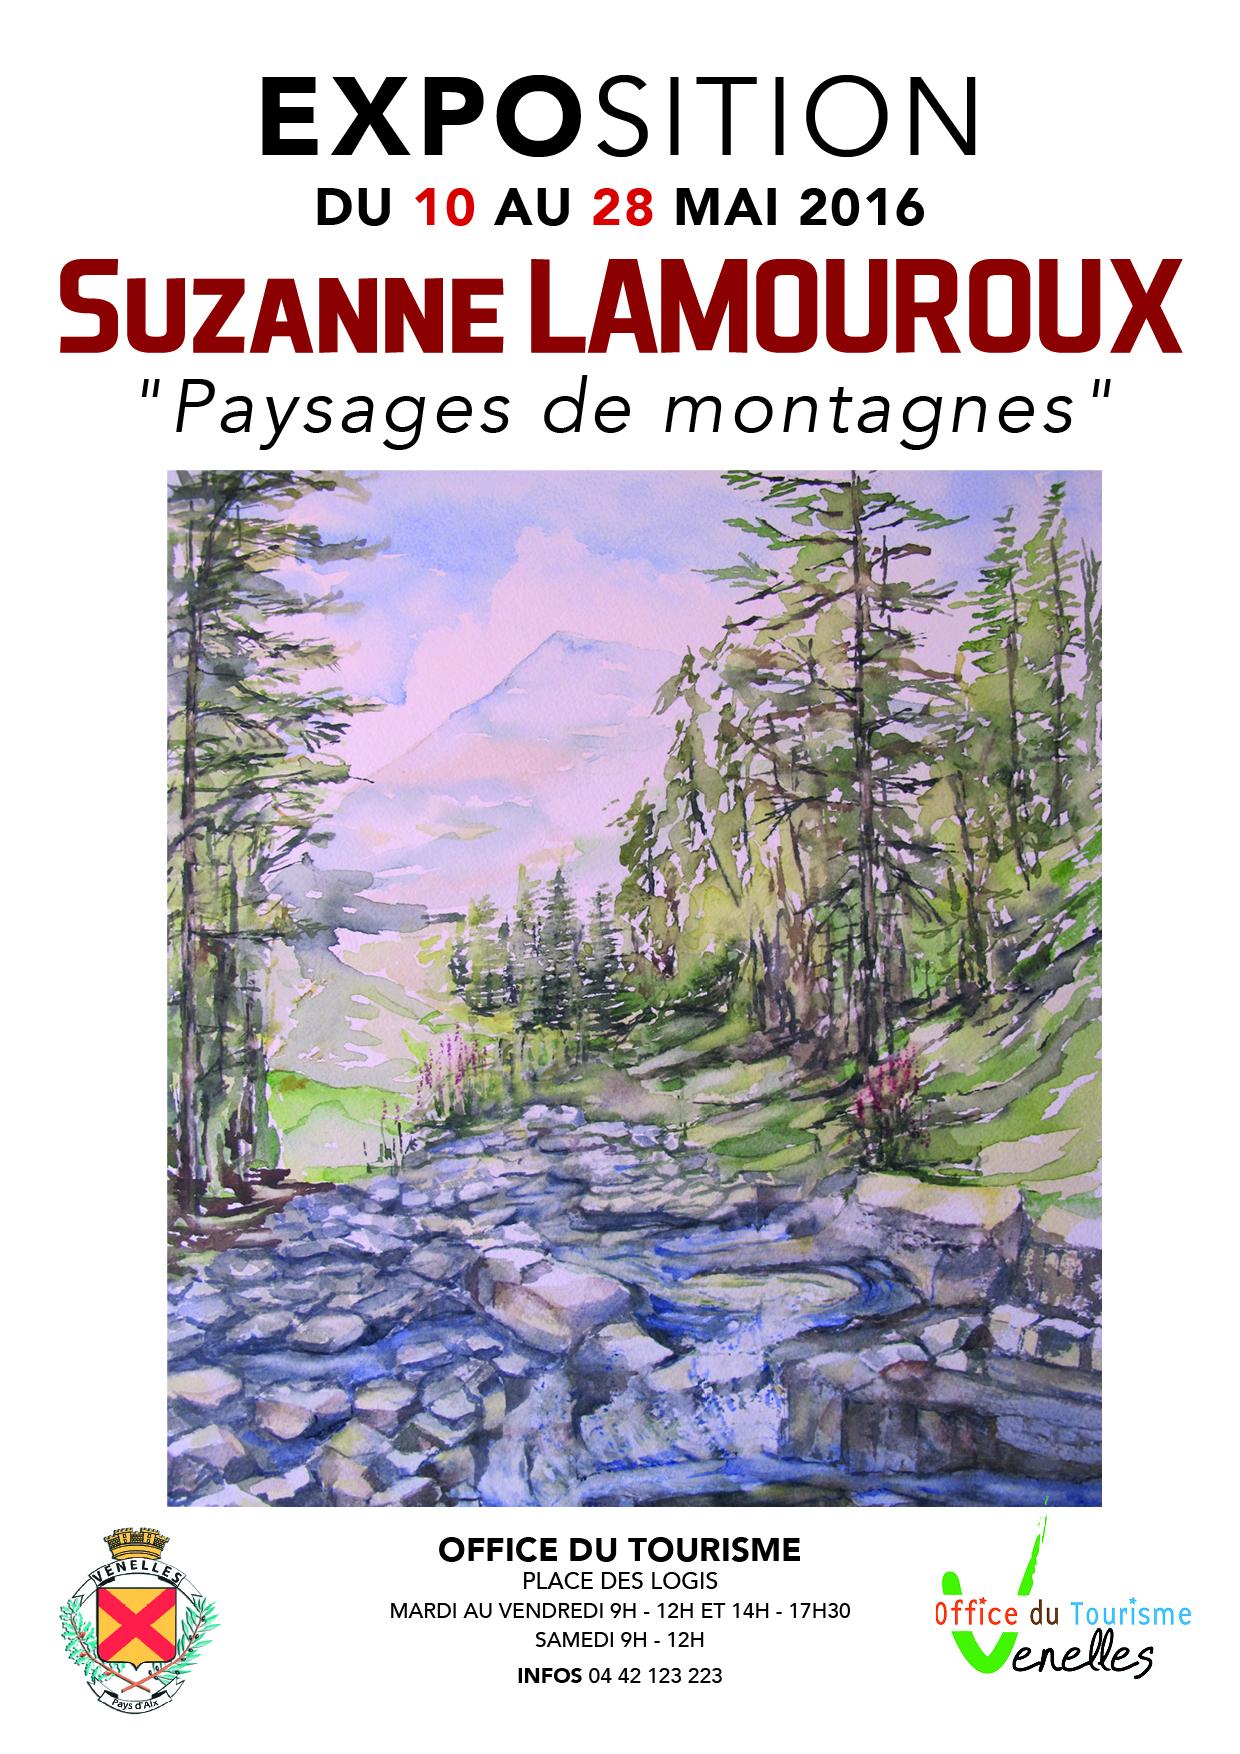 SuzanneLamouroux